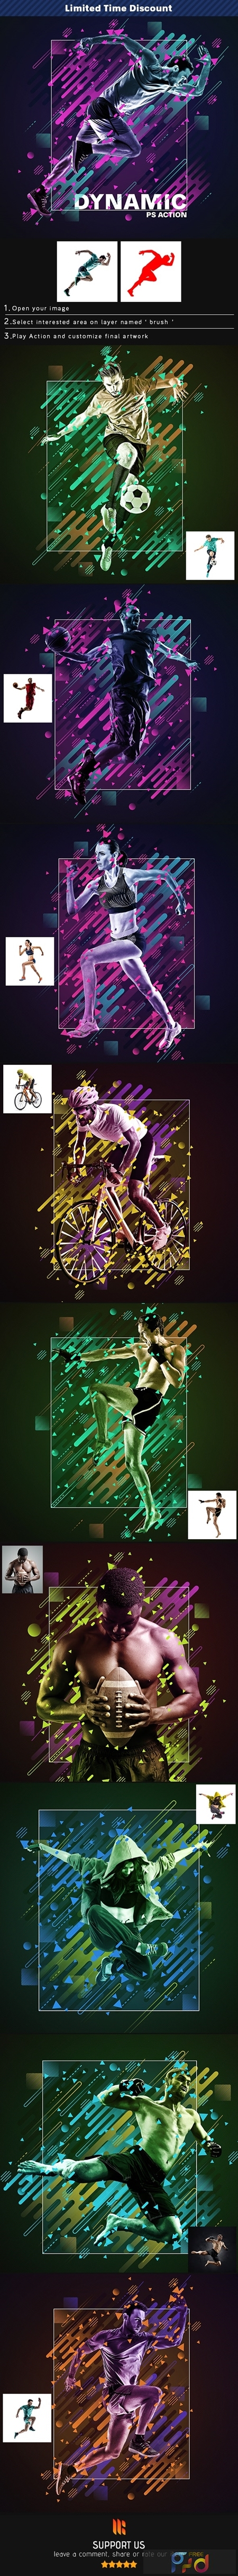 Dynamic Photoshop Action 25755987 1